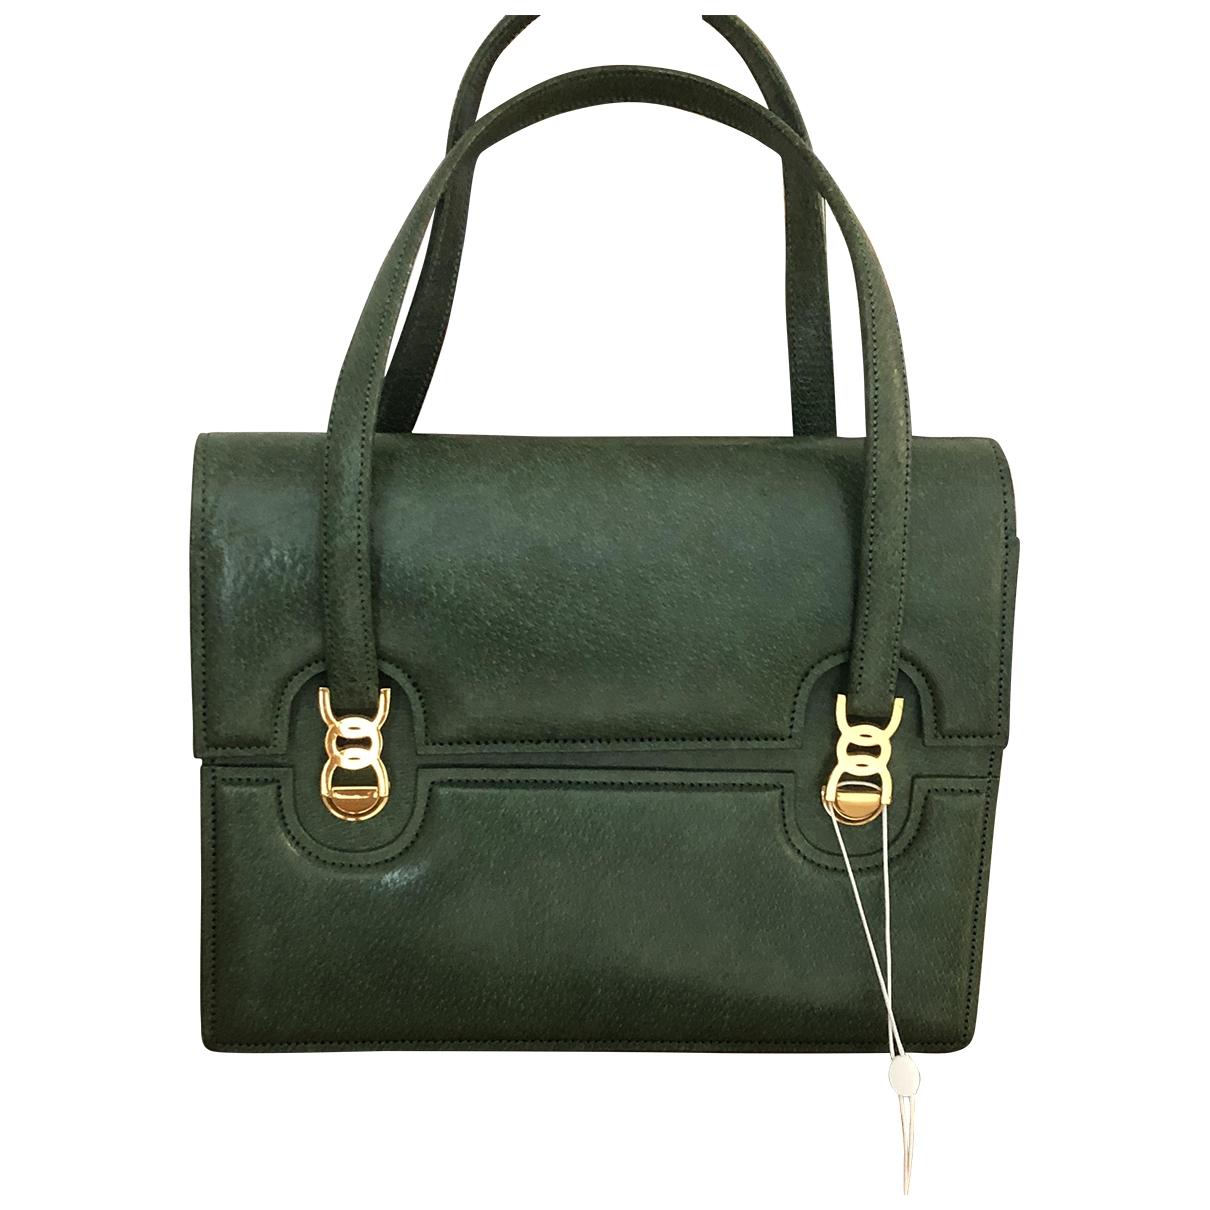 Gucci - Sac a main   pour femme en cuir - vert